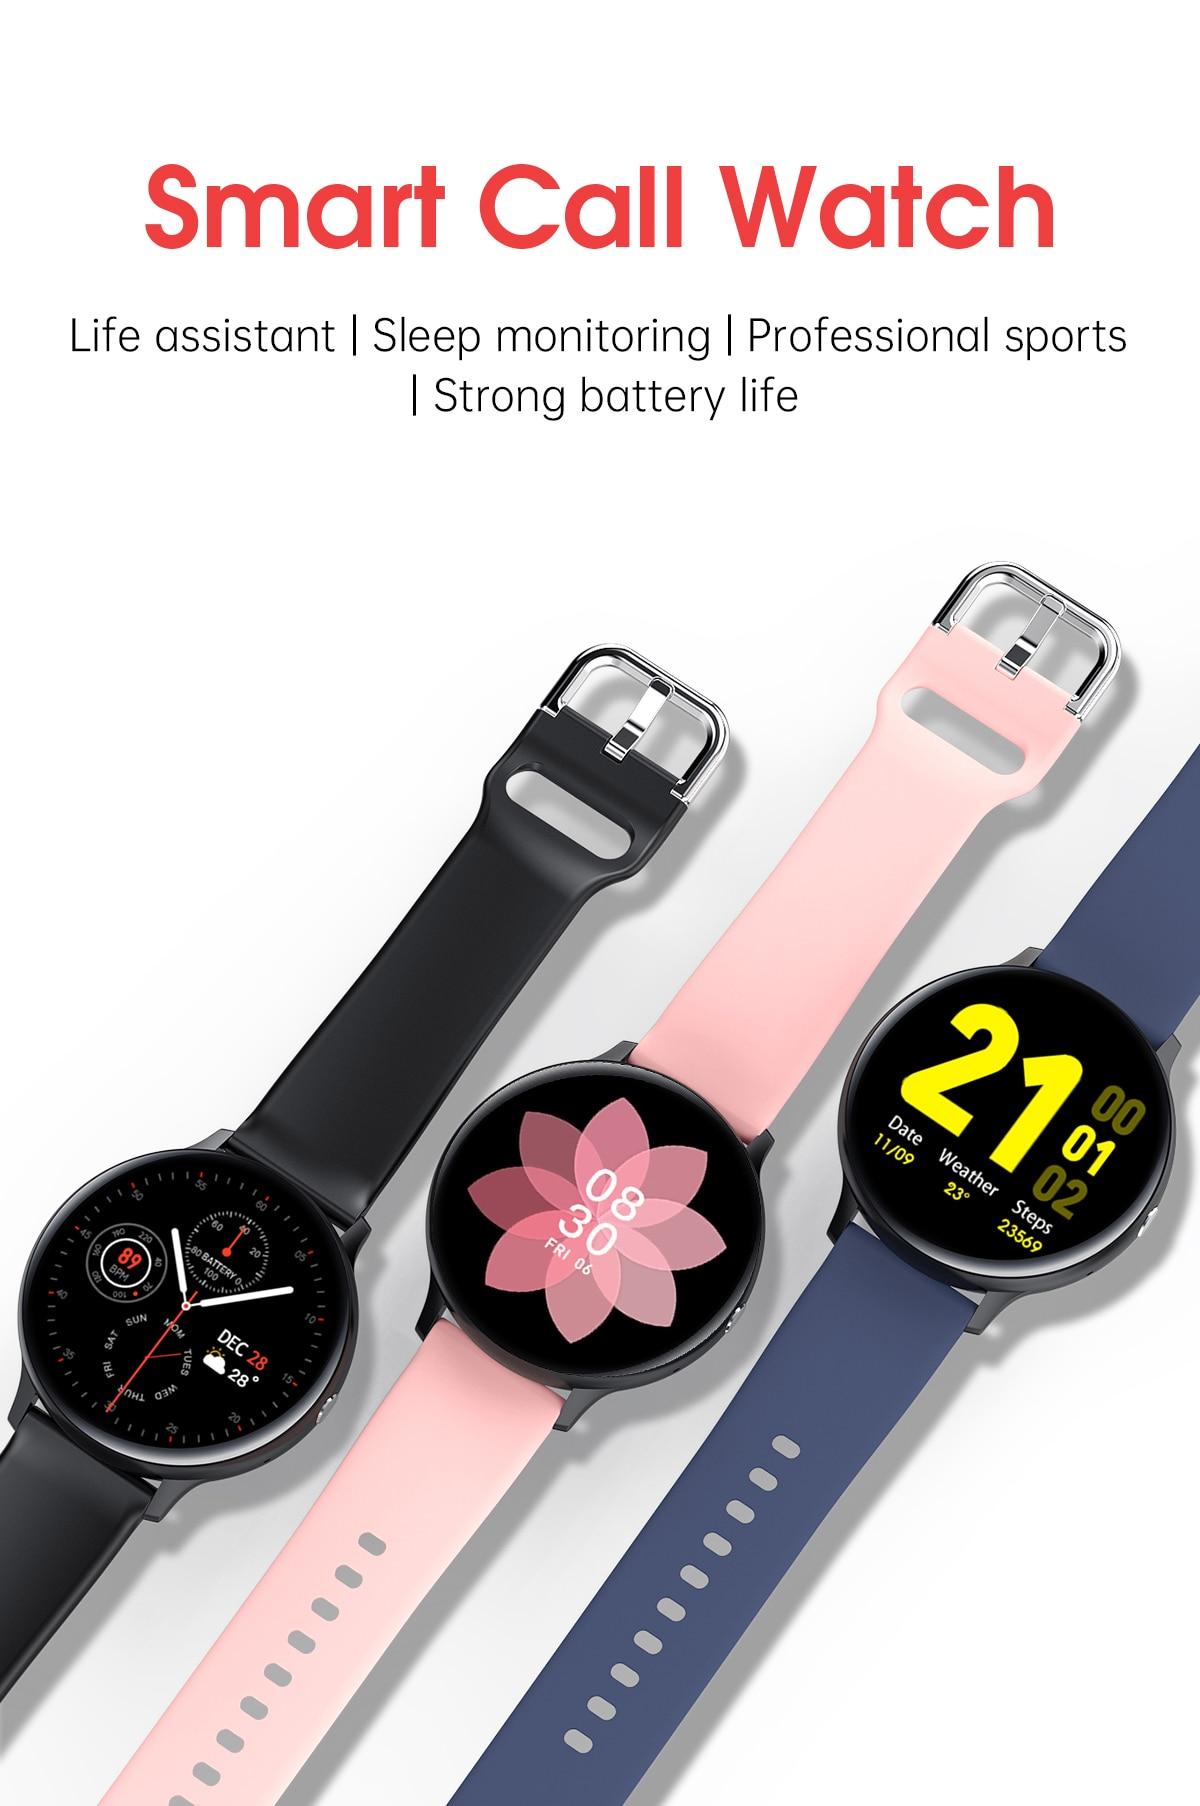 H073df75bb49d4d97b7928a7cc67ea448o LIGE 2021 Bluetooth Answer Call Smart Watch Men Full Touch Dial Call Fitness Tracker IP67 Waterproof 4G ROM Smartwatch for women